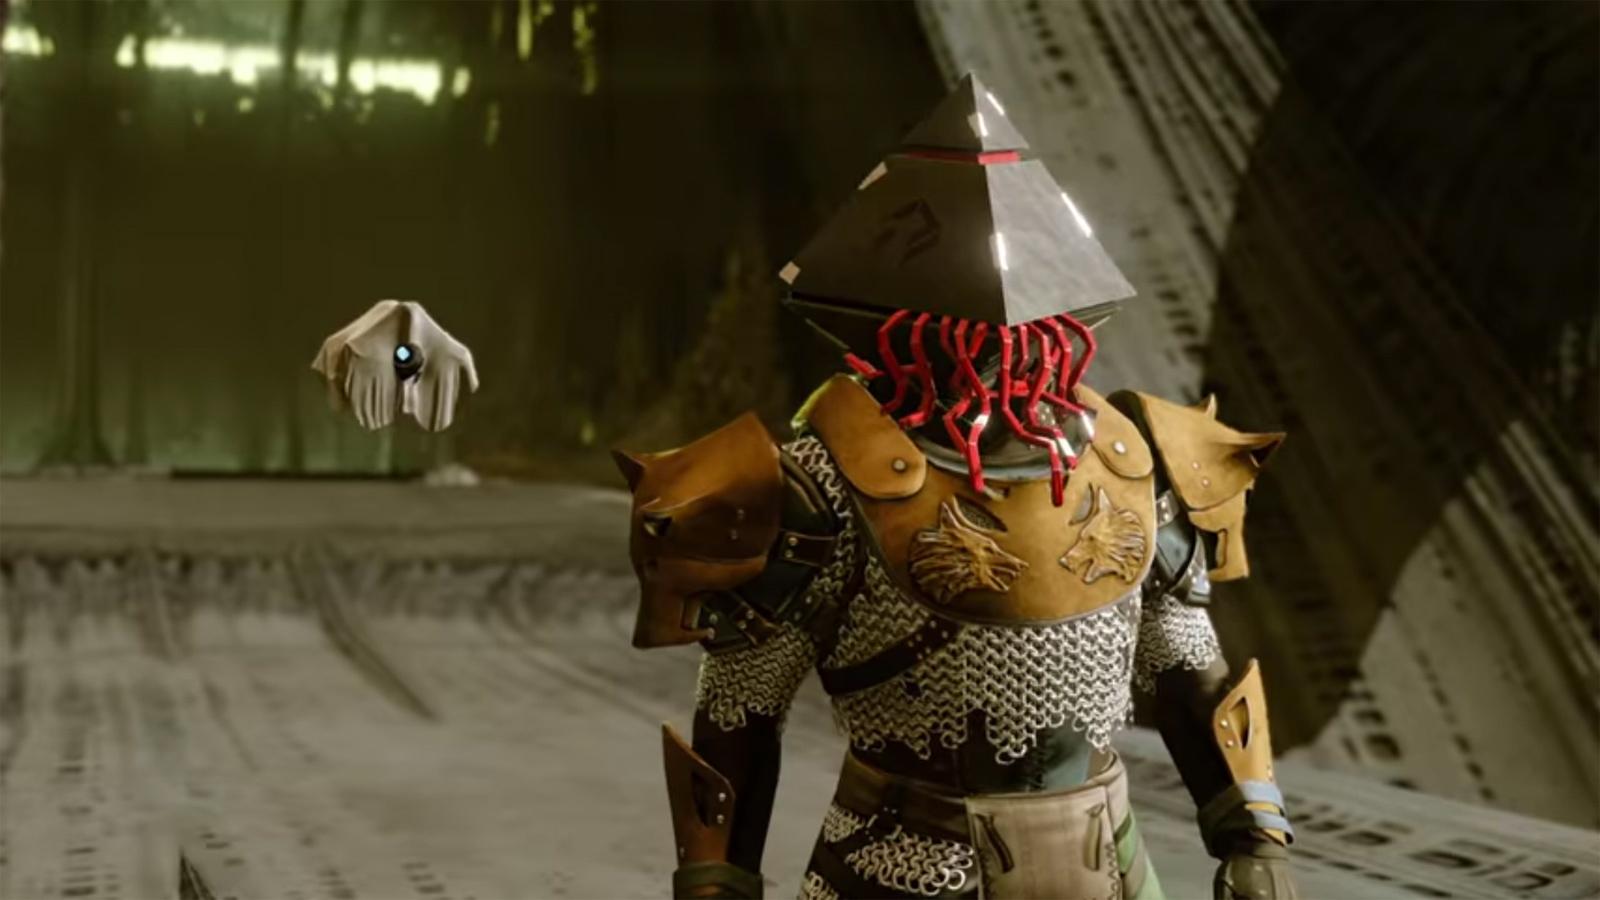 Destiny 2 isn't celebrating Halloween this year screenshot